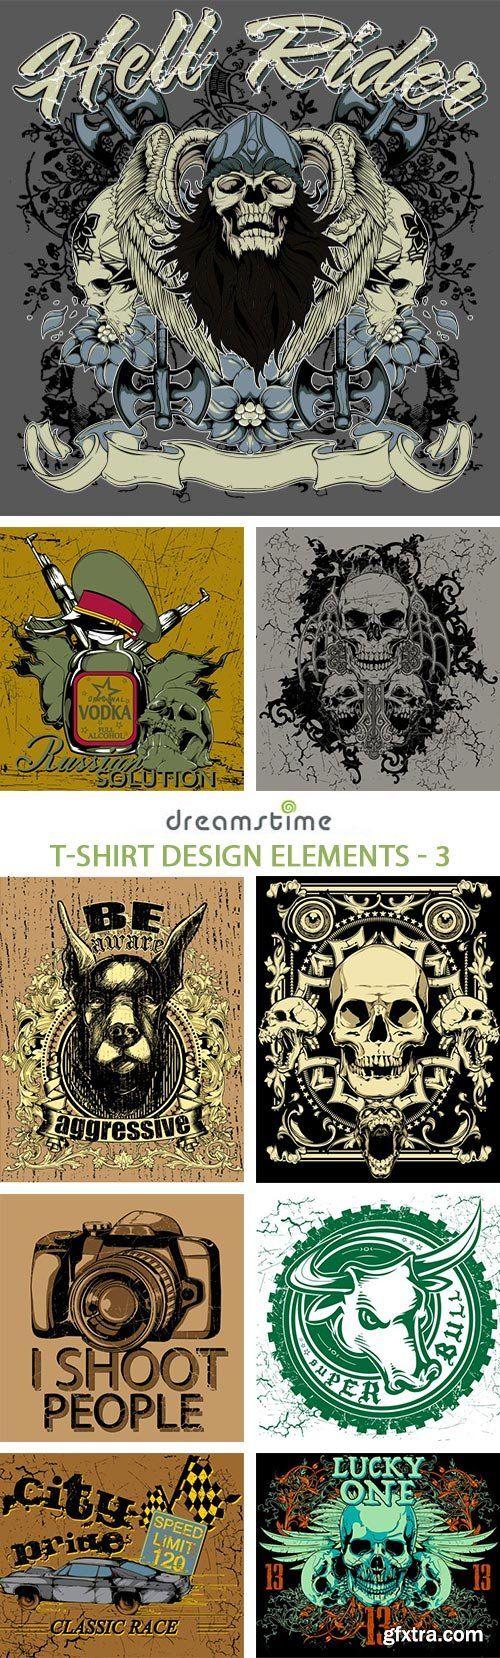 T shirt design 7 25xeps -  T Shirt Design Elements 3 25xeps Download